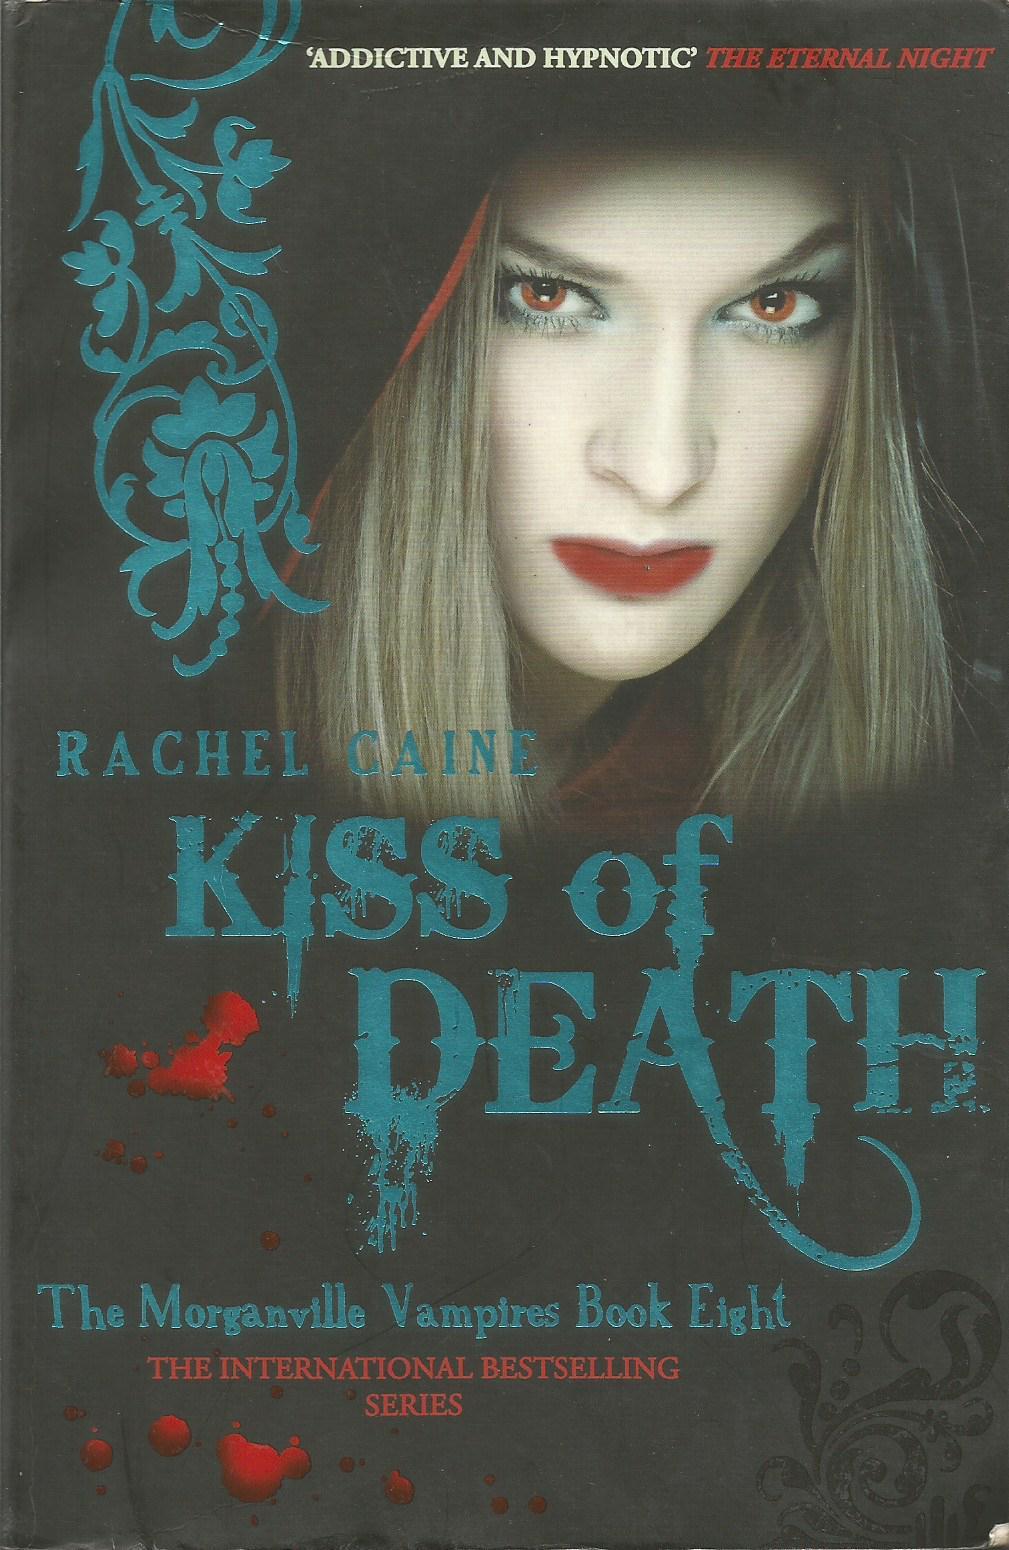 Kiss of Death: Morganville Vampires, Book 8